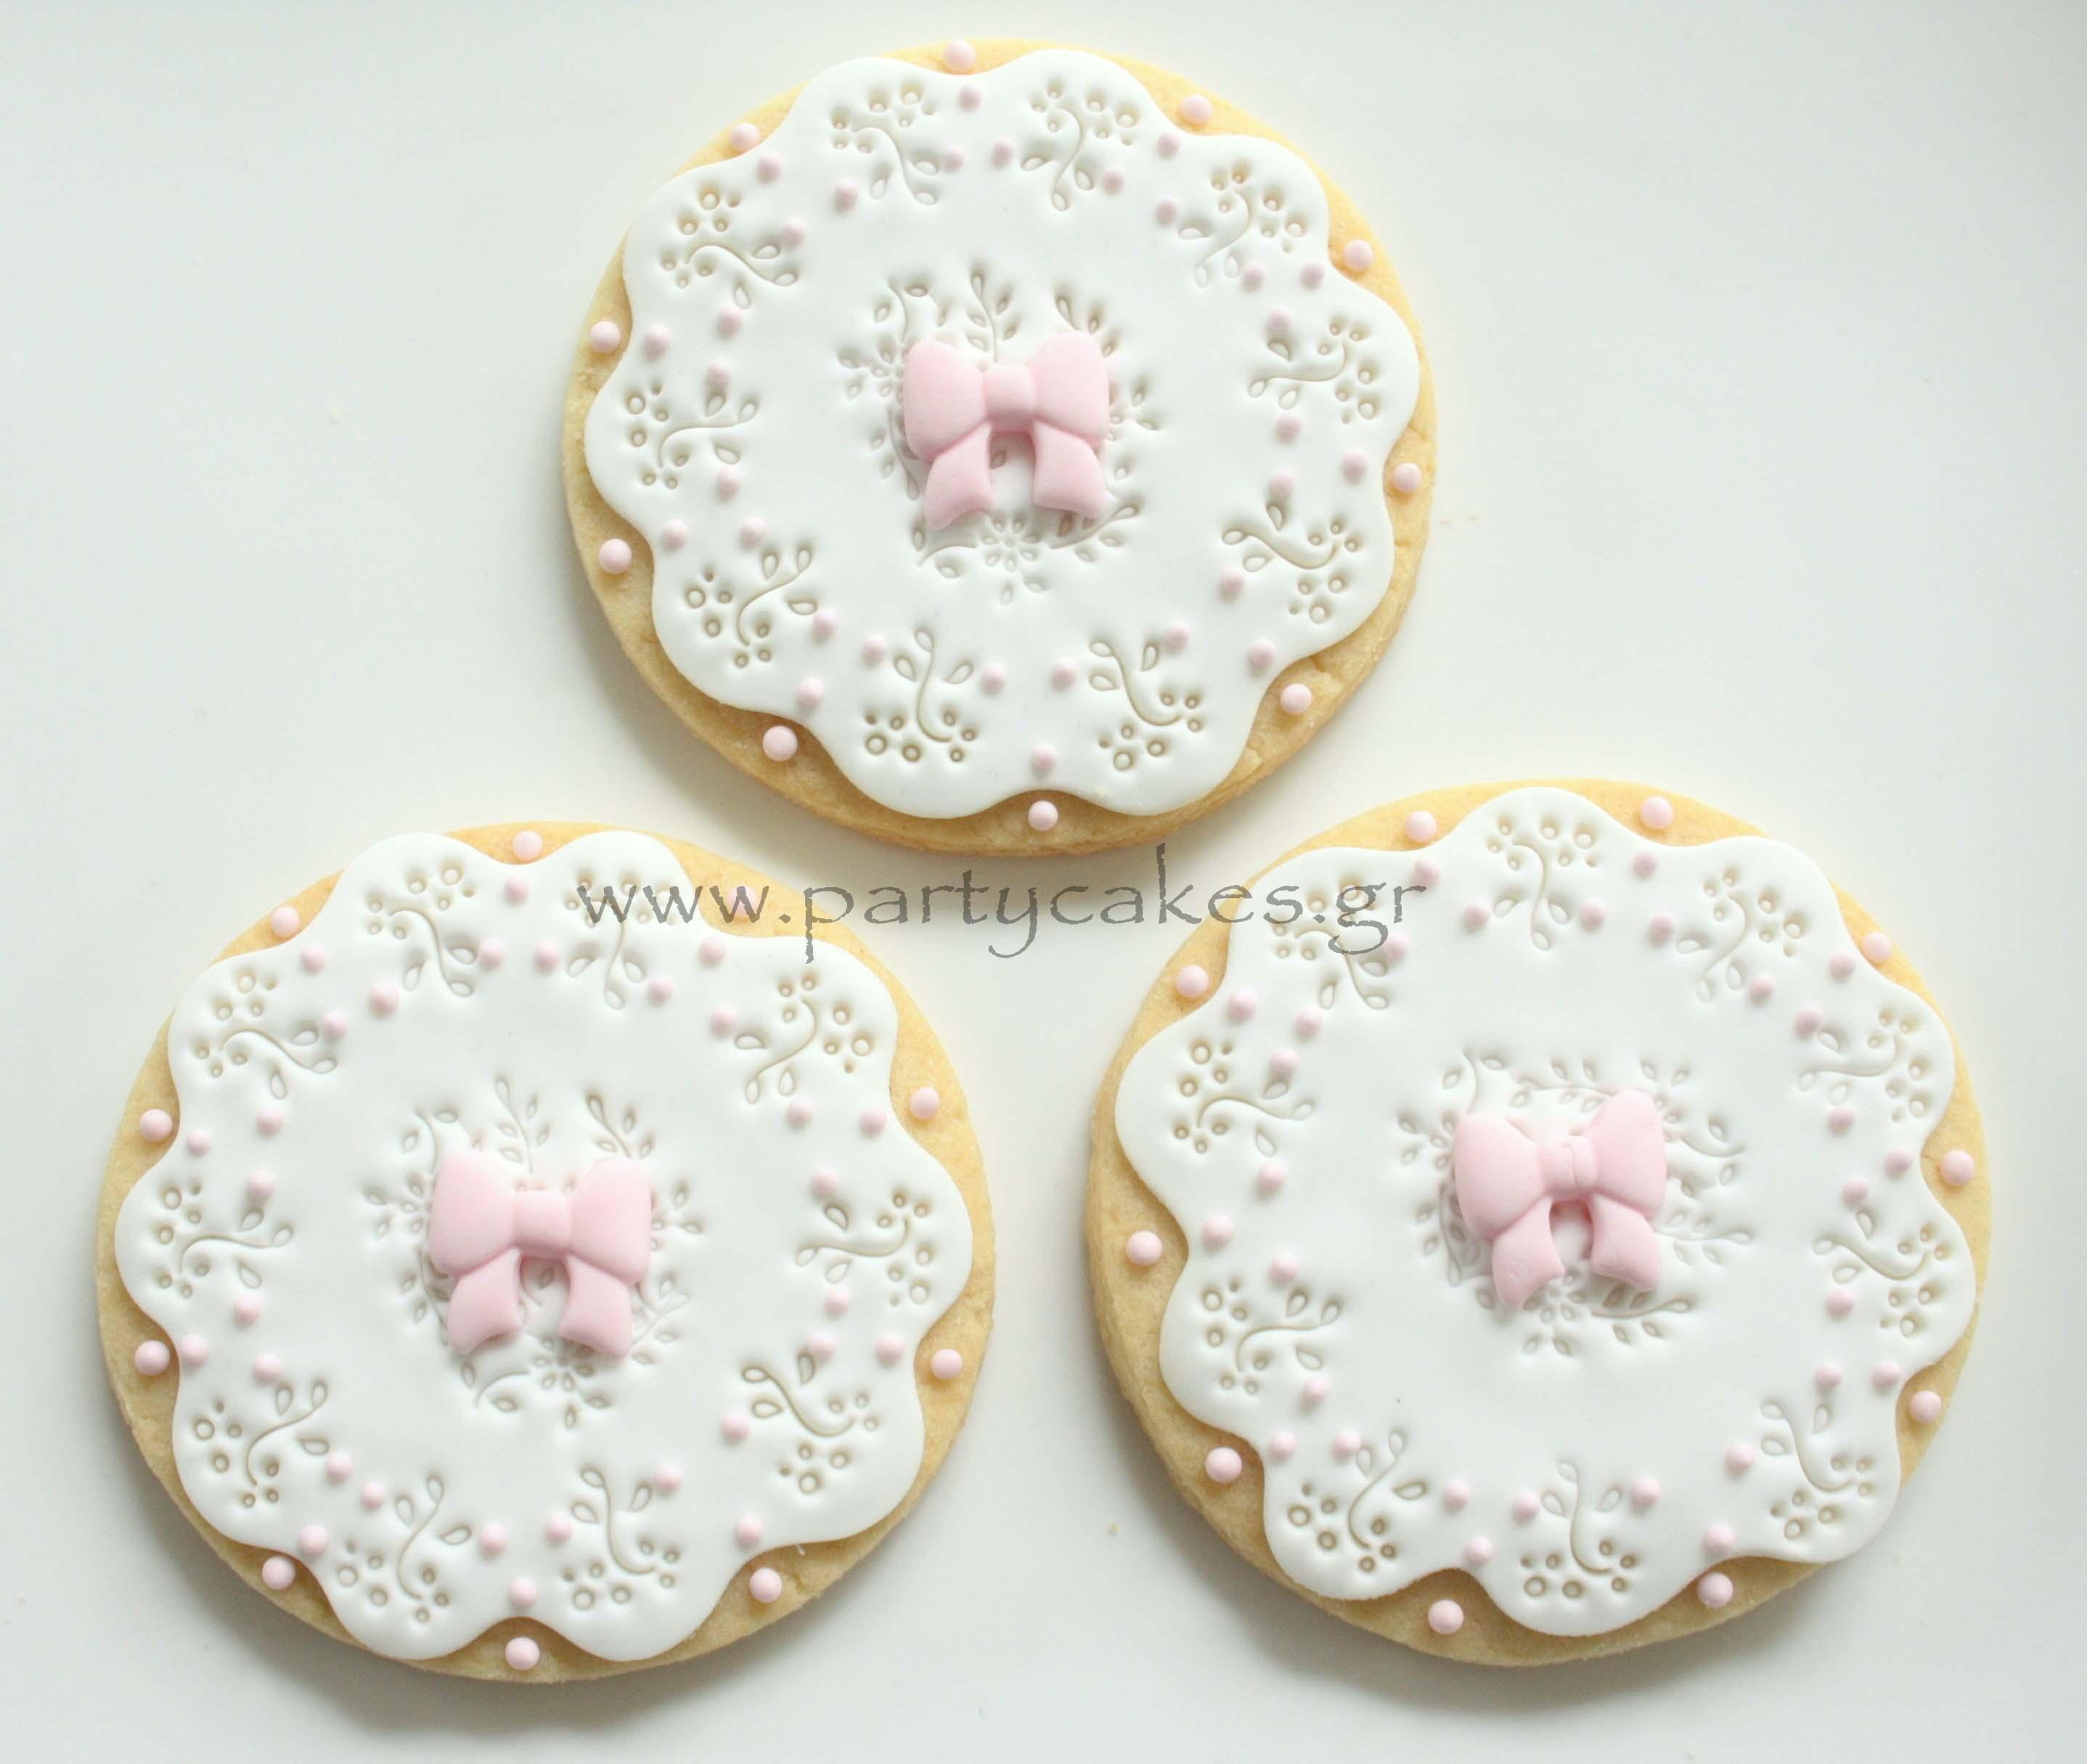 Doily Cookies 1.jpg